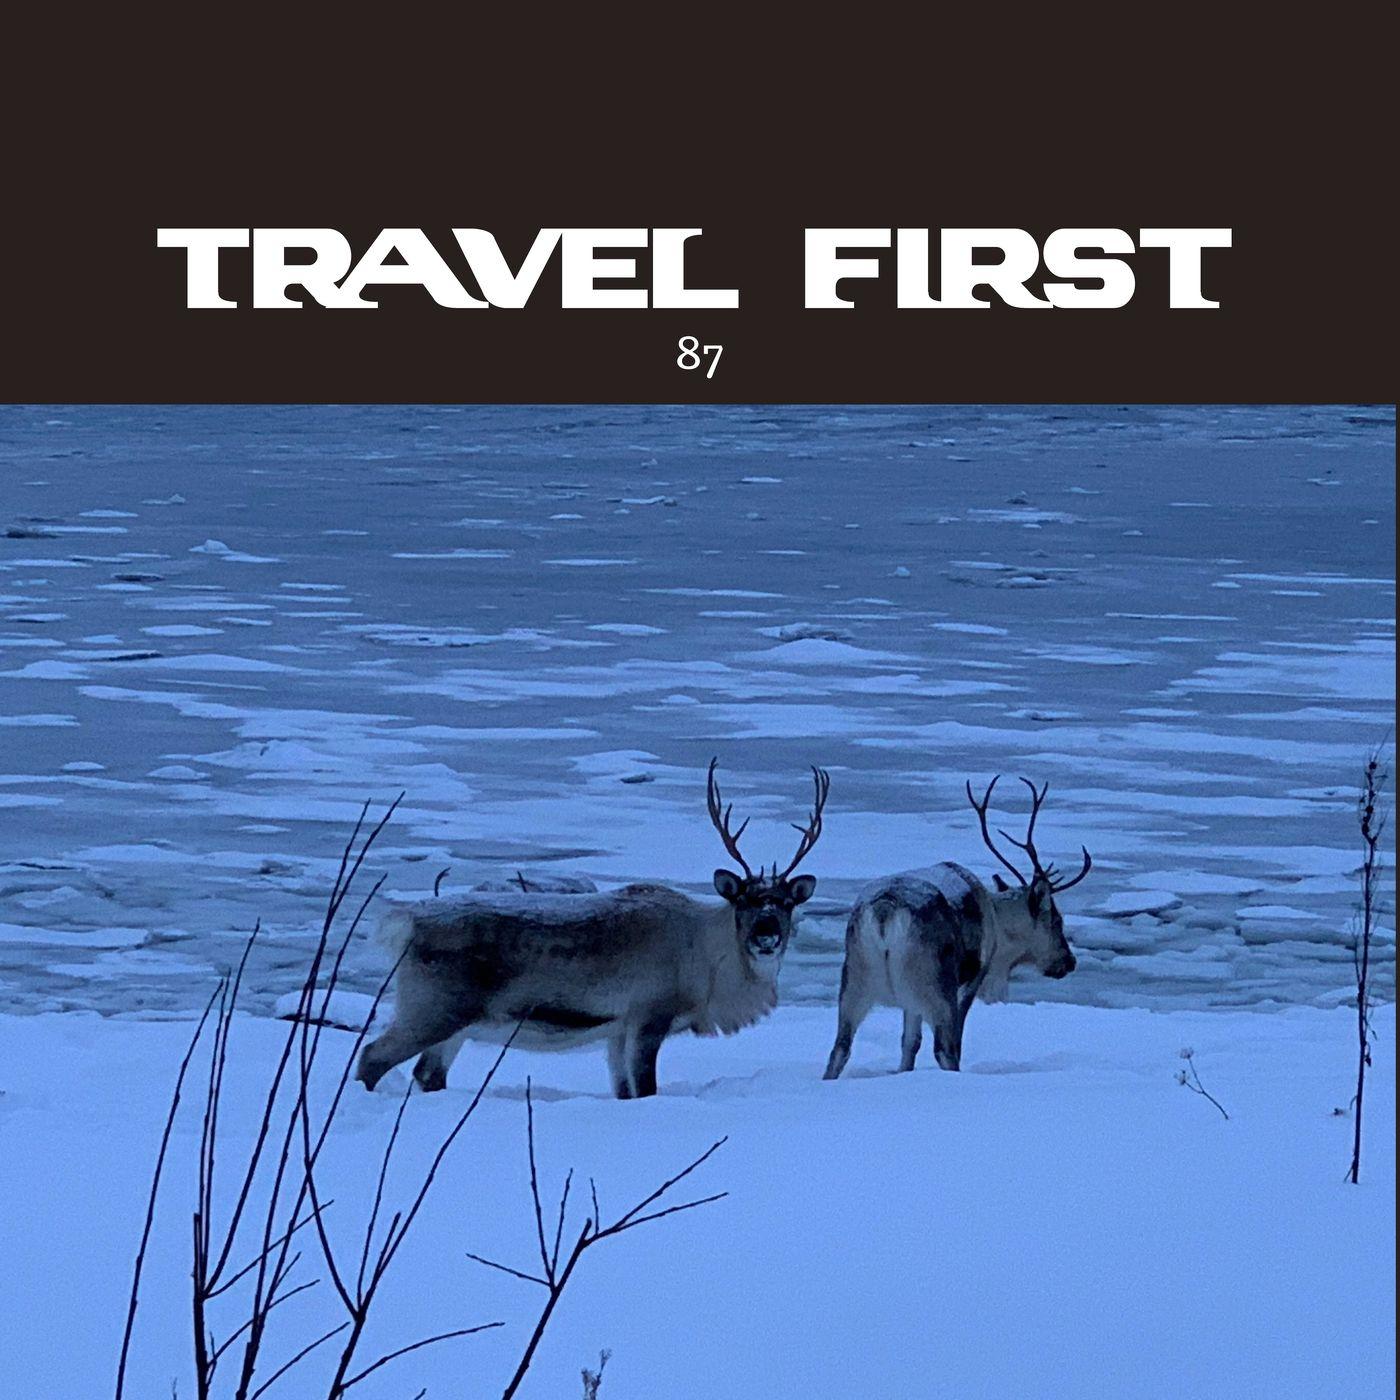 87: Norway Day 9 - Tromso Day 7